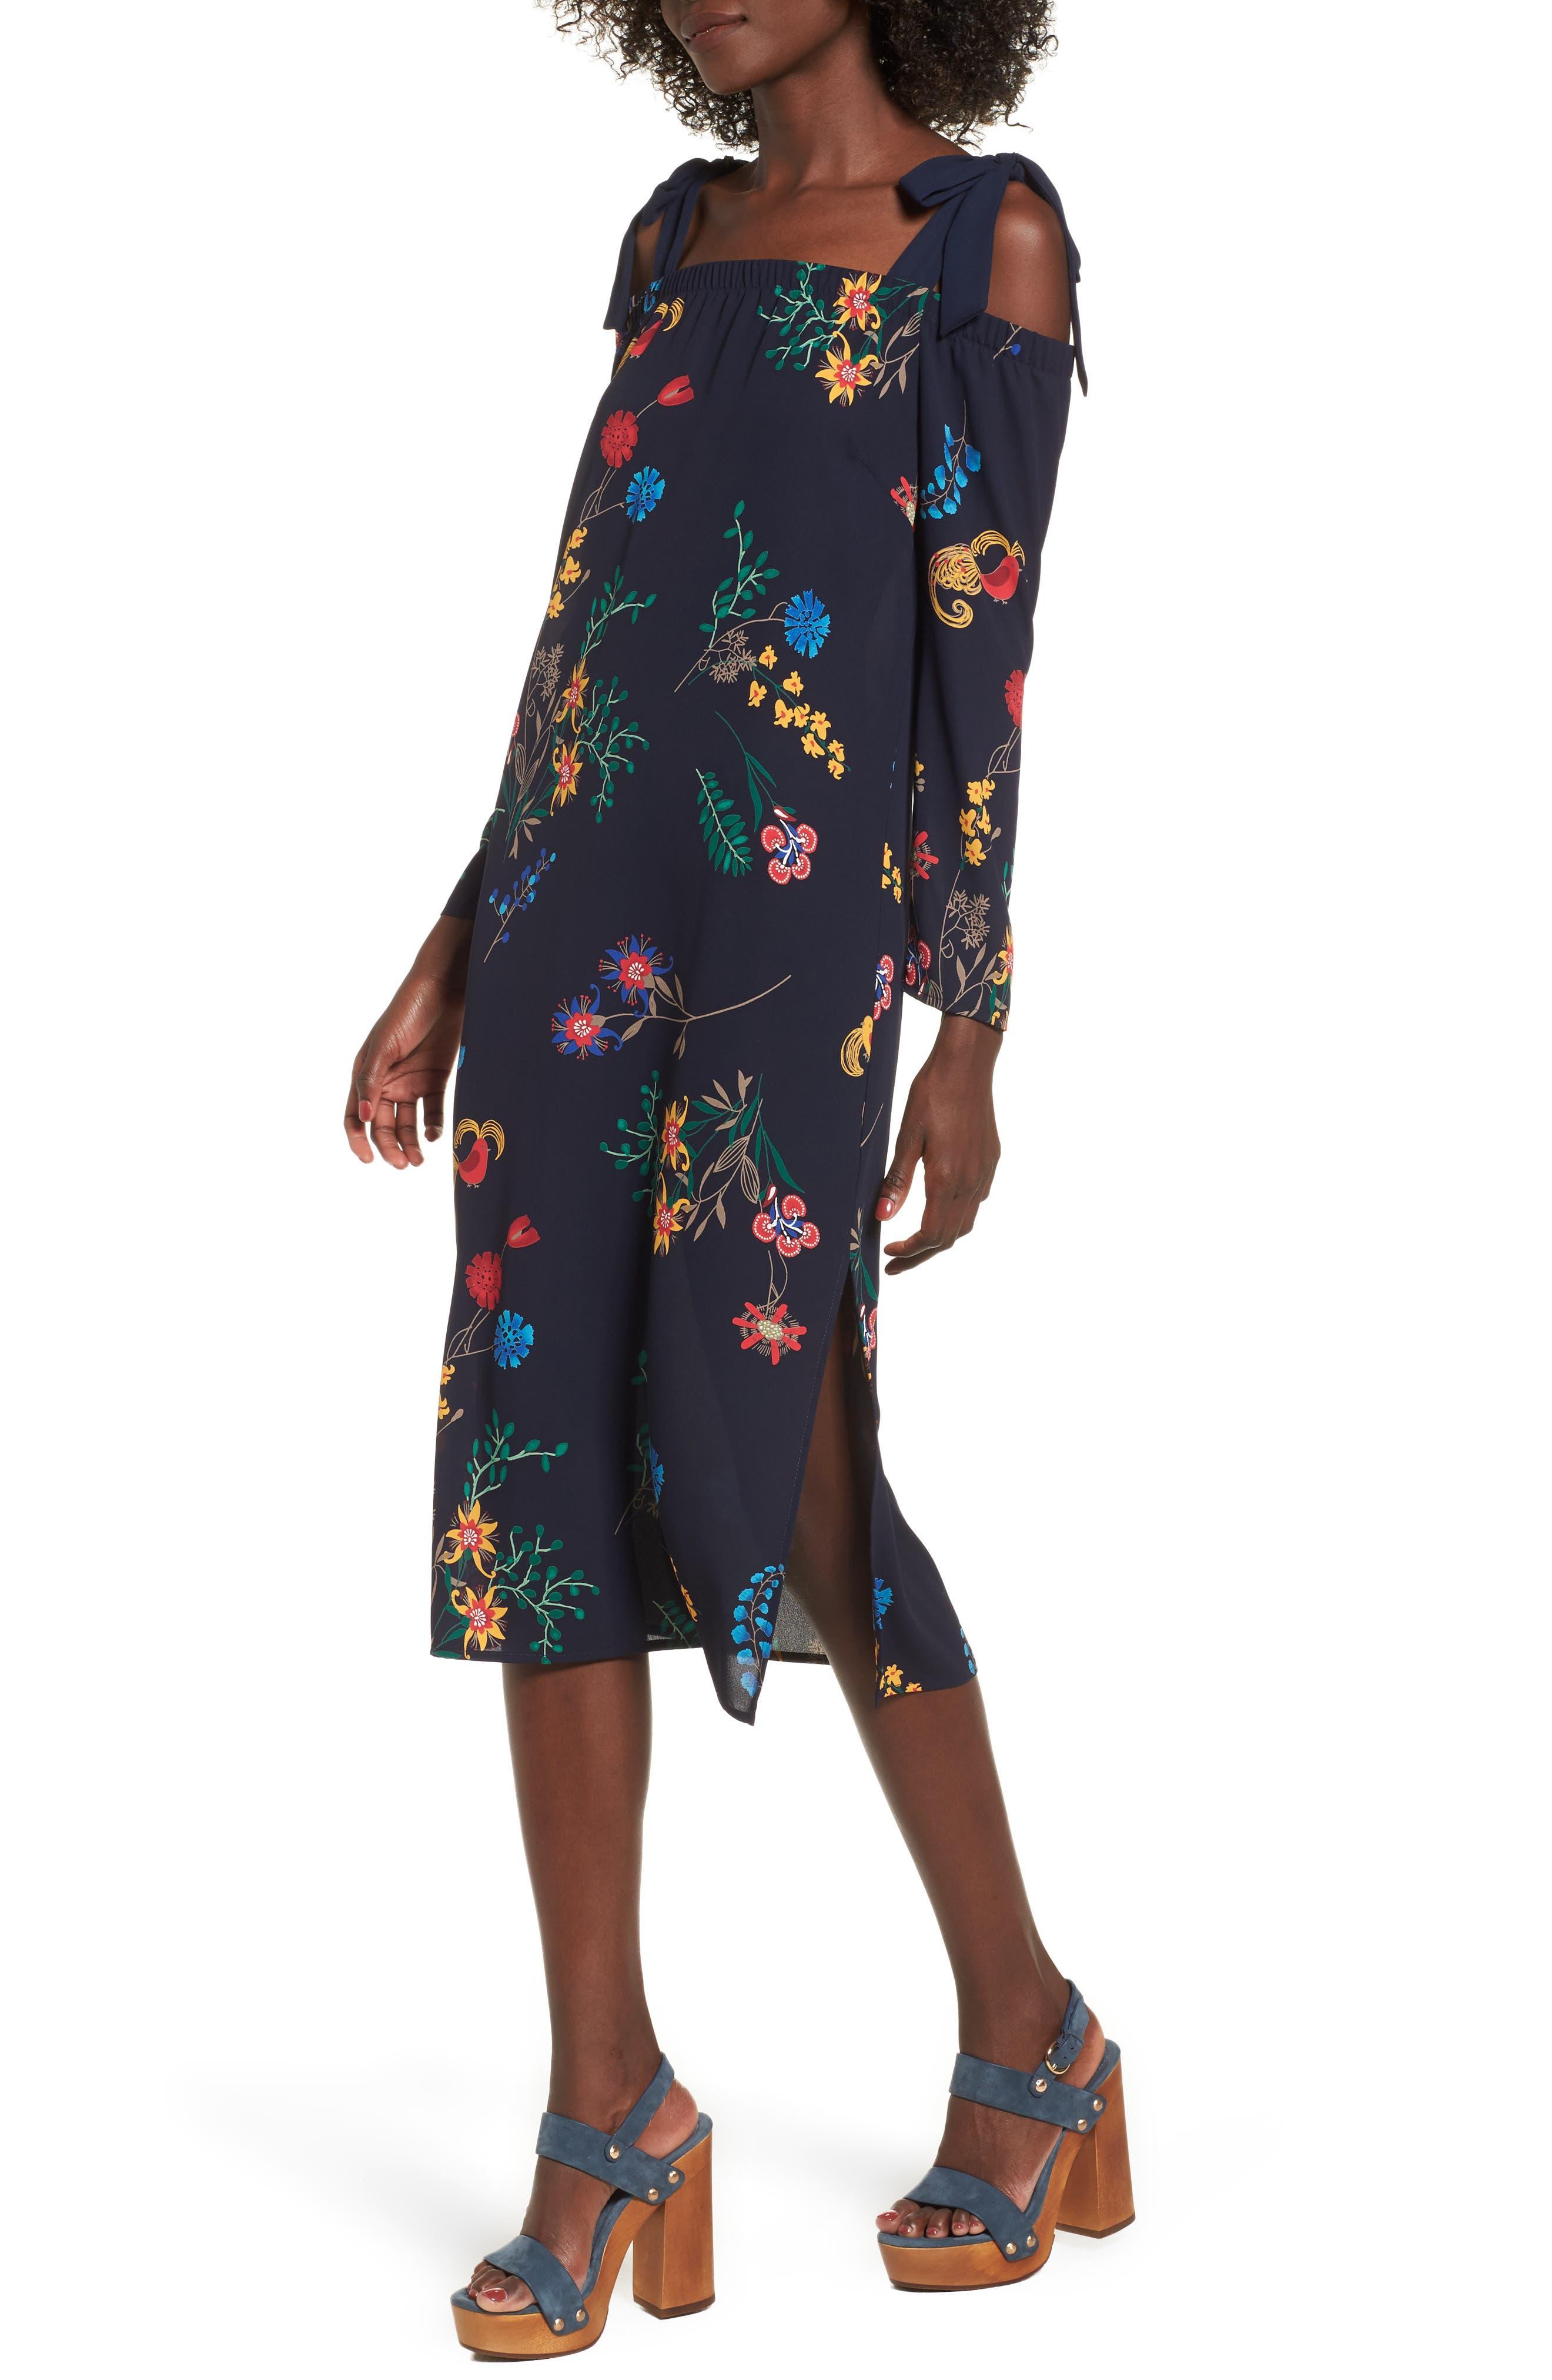 Alternate Image 1 Selected - Soprano Print Off the Shoulder Midi Dress